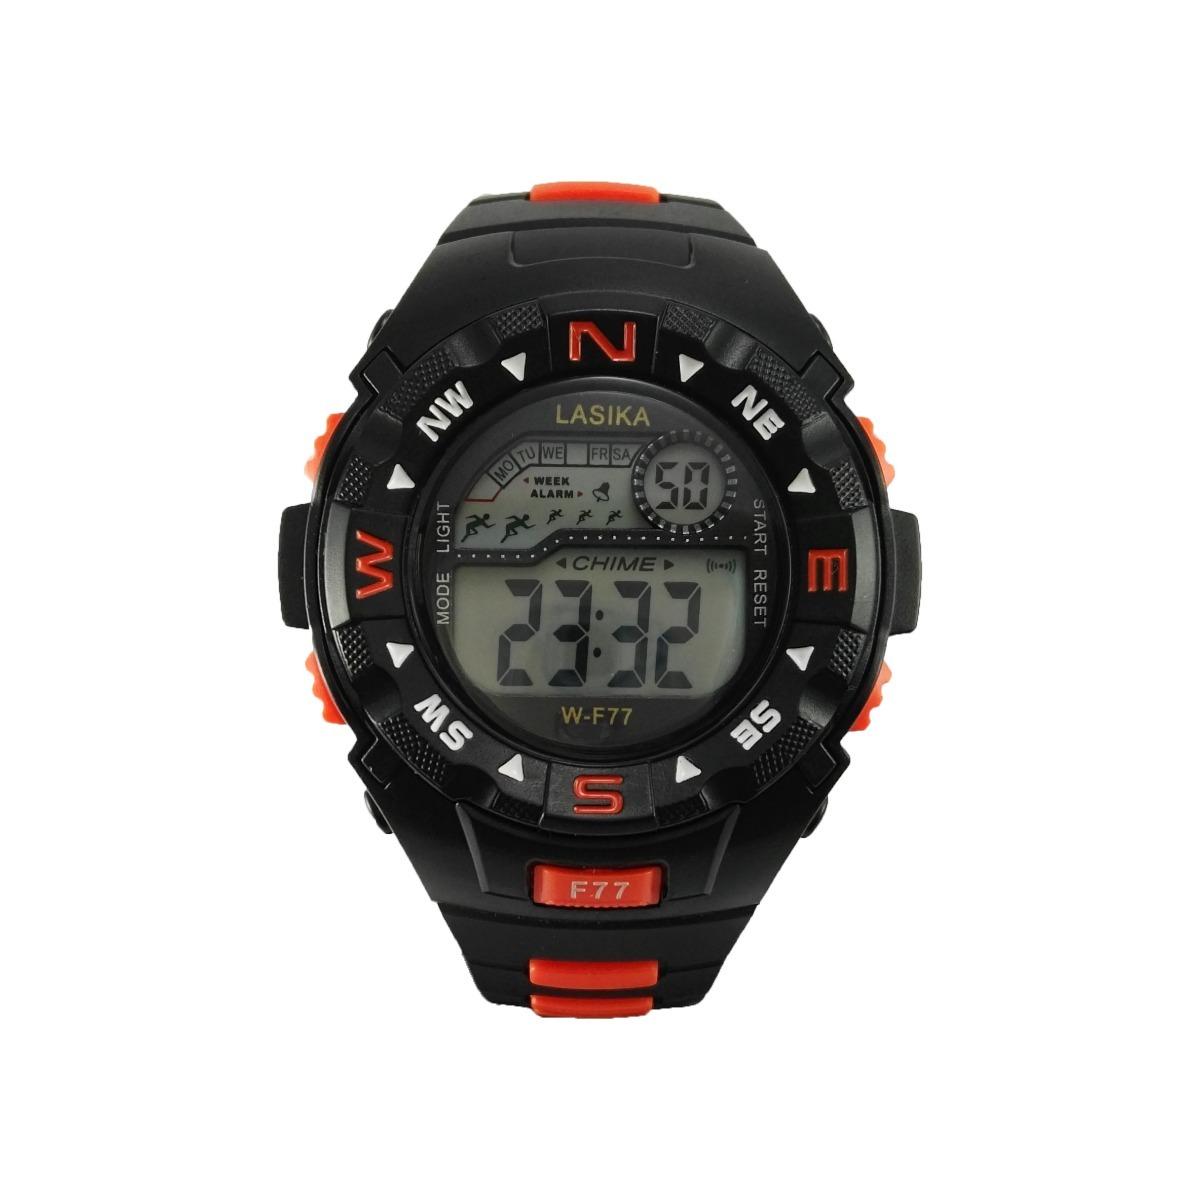 903fe2109a0f Reloj Deportivo Mujer Naranja Sumergible Cronometro Luz Gym -   350 ...